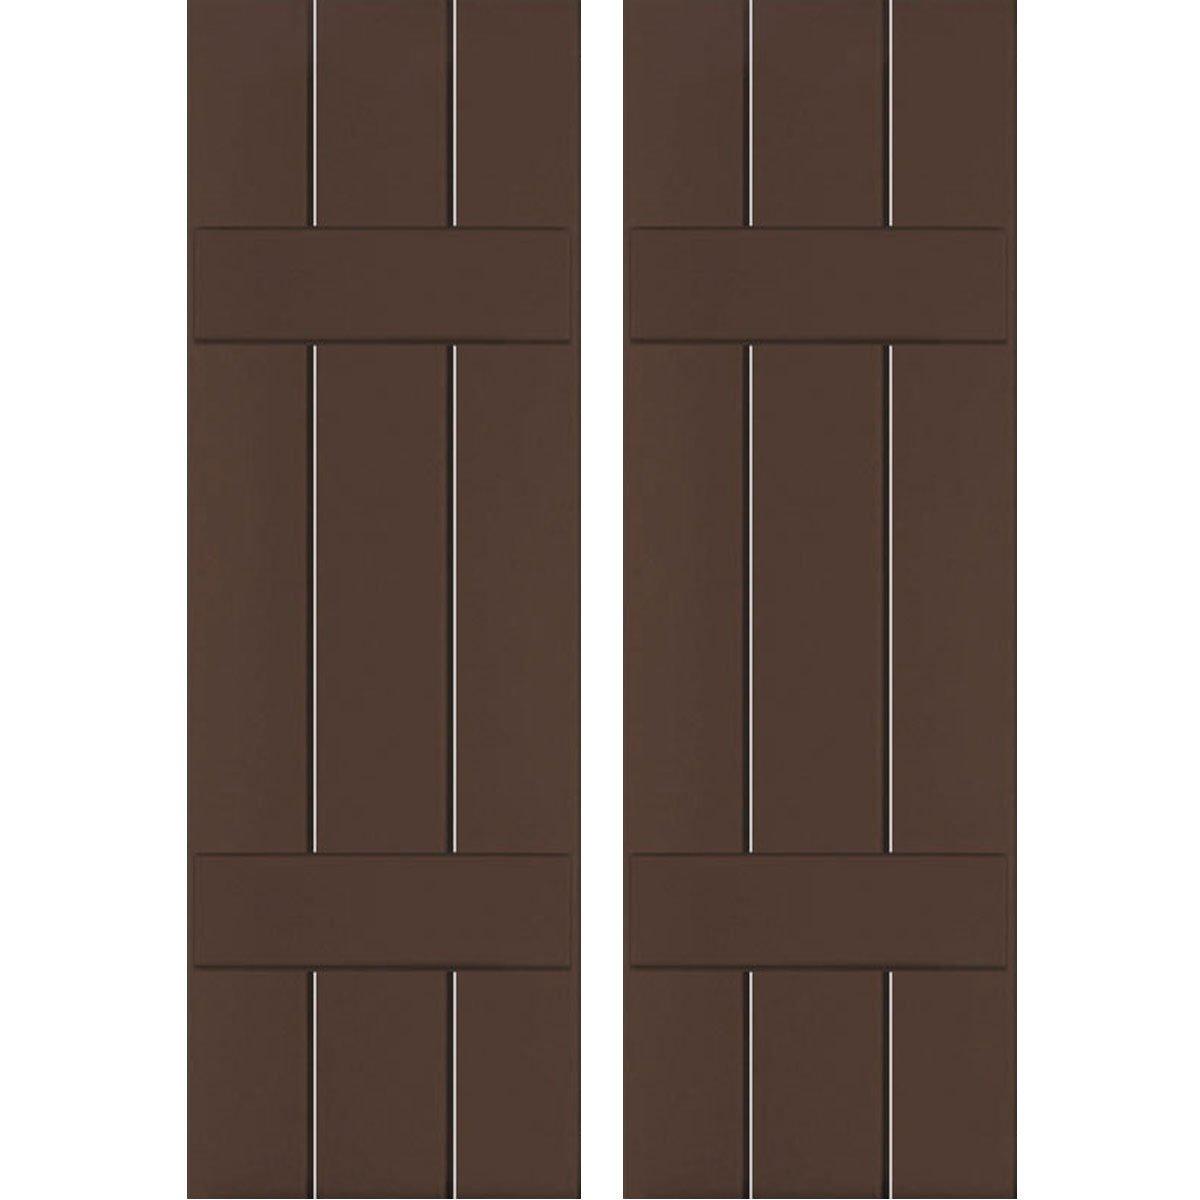 Ekena Millwork CWB12X027TBC Exterior Three Board